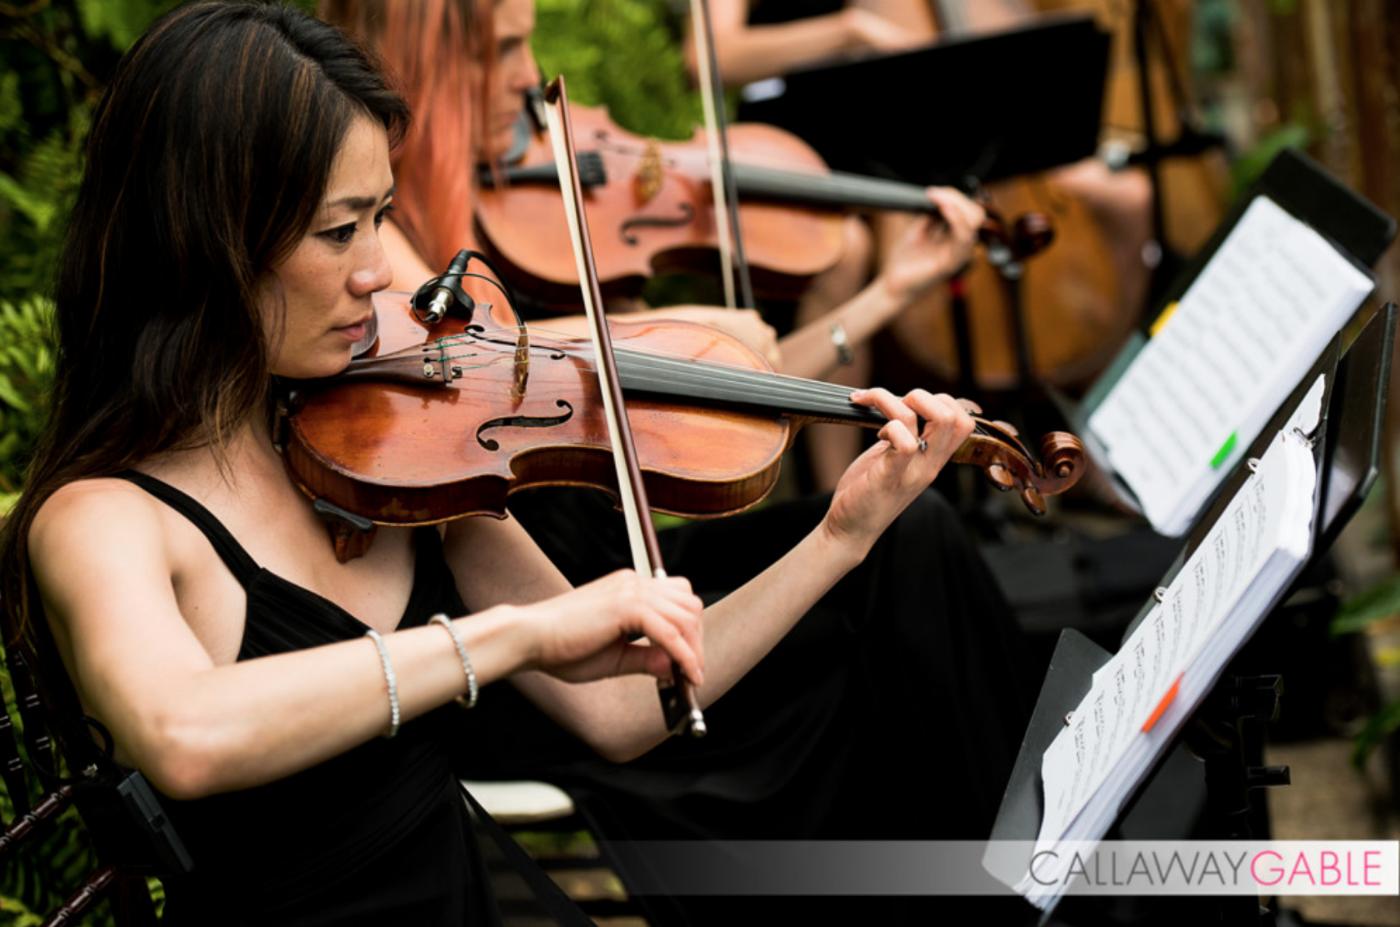 los-angeles-wedding-music-ceremony-string-quartet-violin-viola-cello-orange-county-maui-1.png